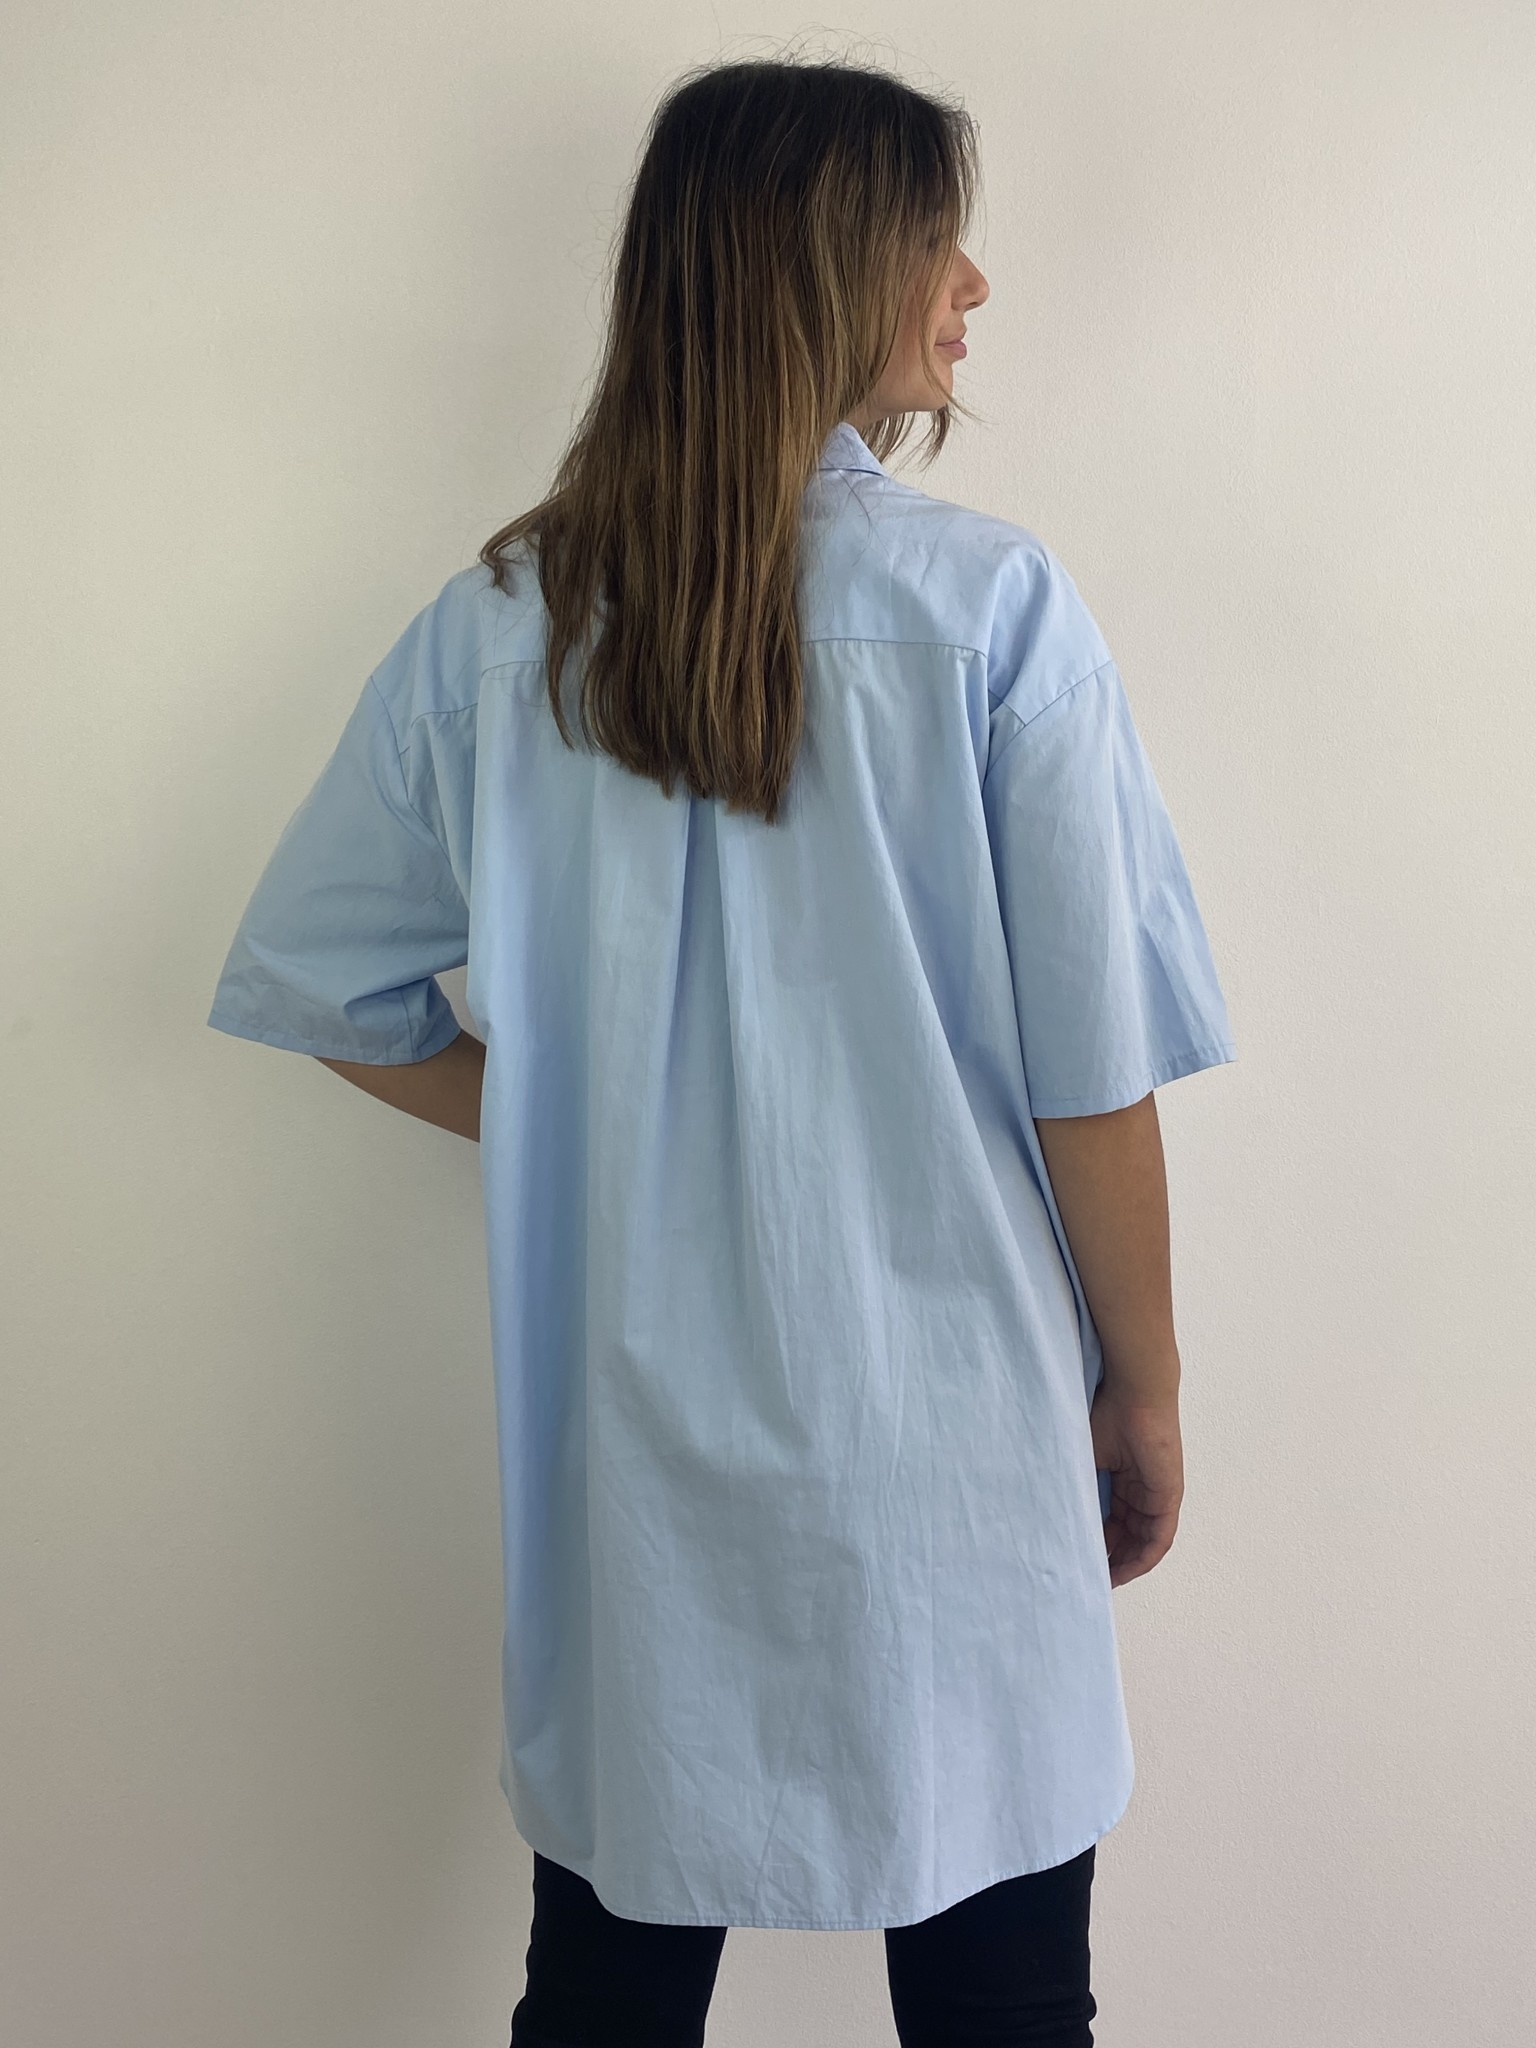 Tammy oversized shirt Light Blue-3